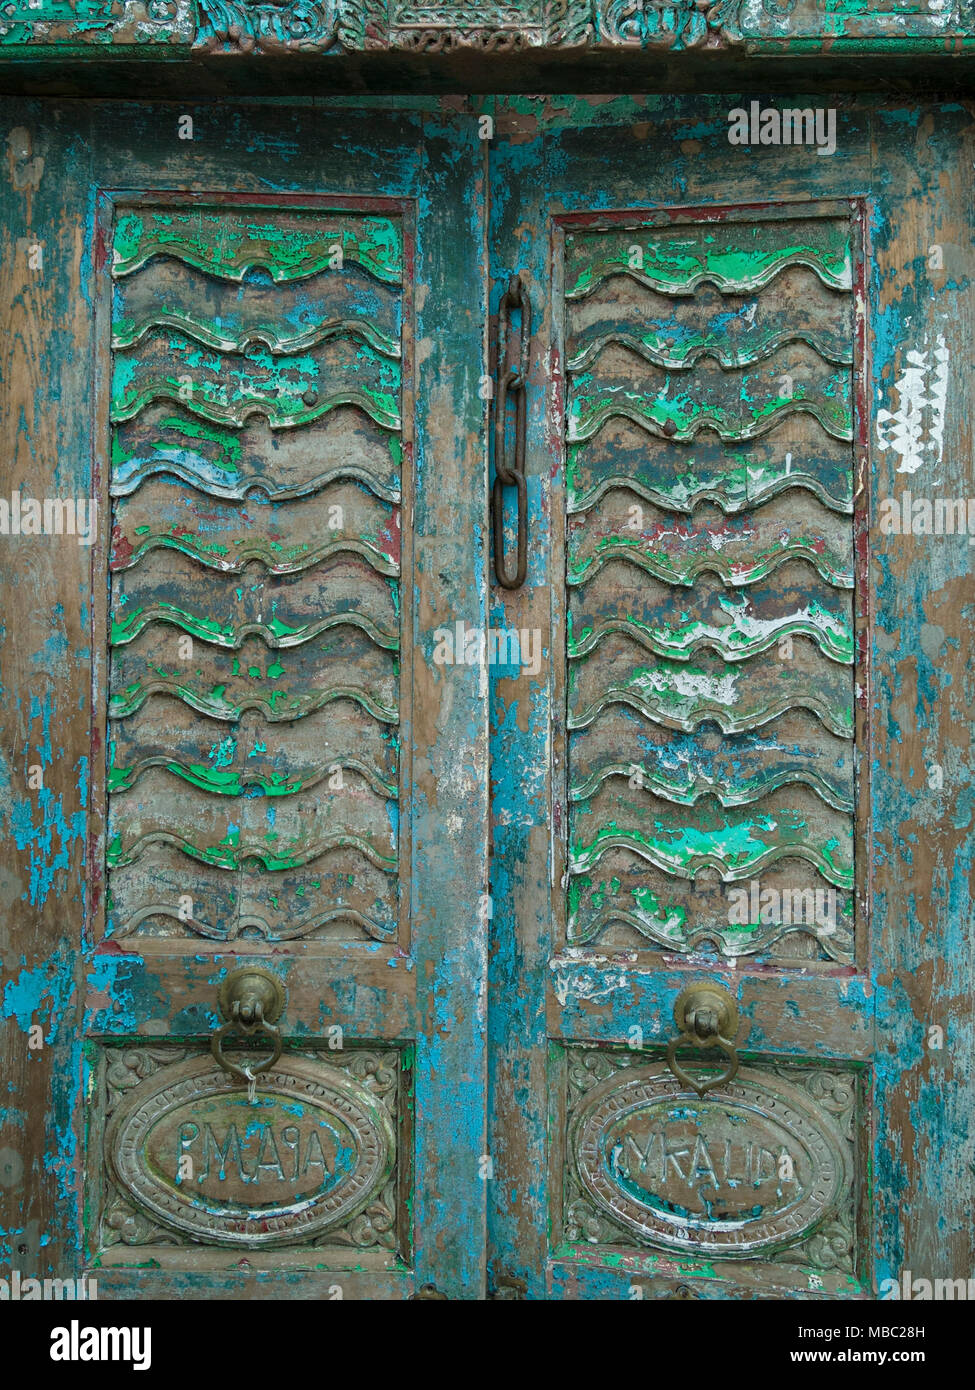 Old Distressed Ornate Antique Wooden Double Doors In Garden